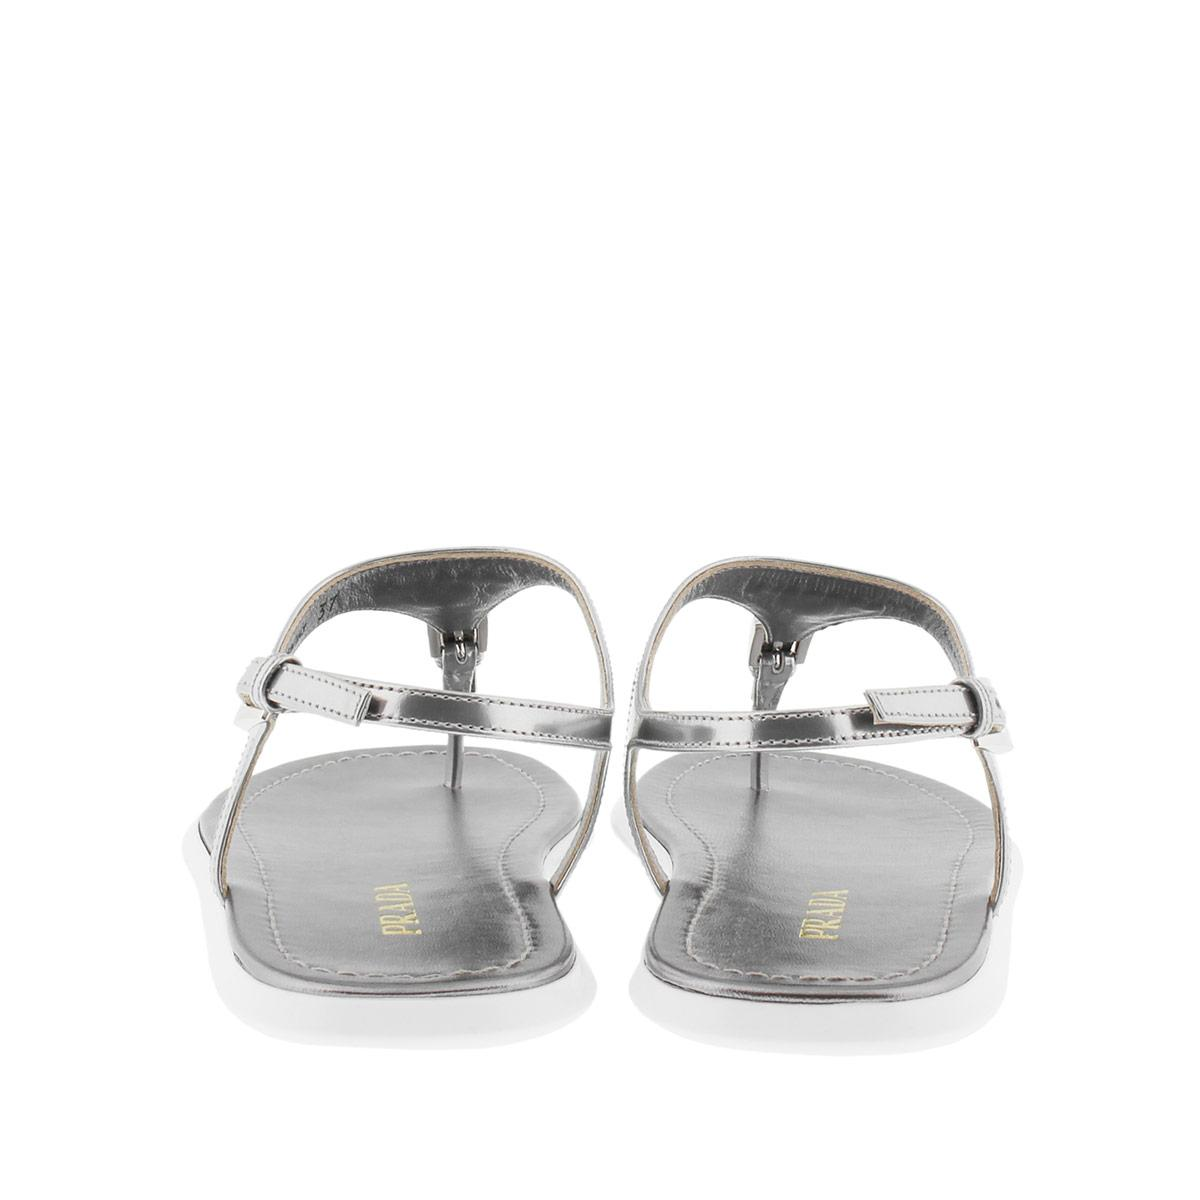 4107099bd Prada Calzature Donna Sandal Metal Leather Argento - Lyst